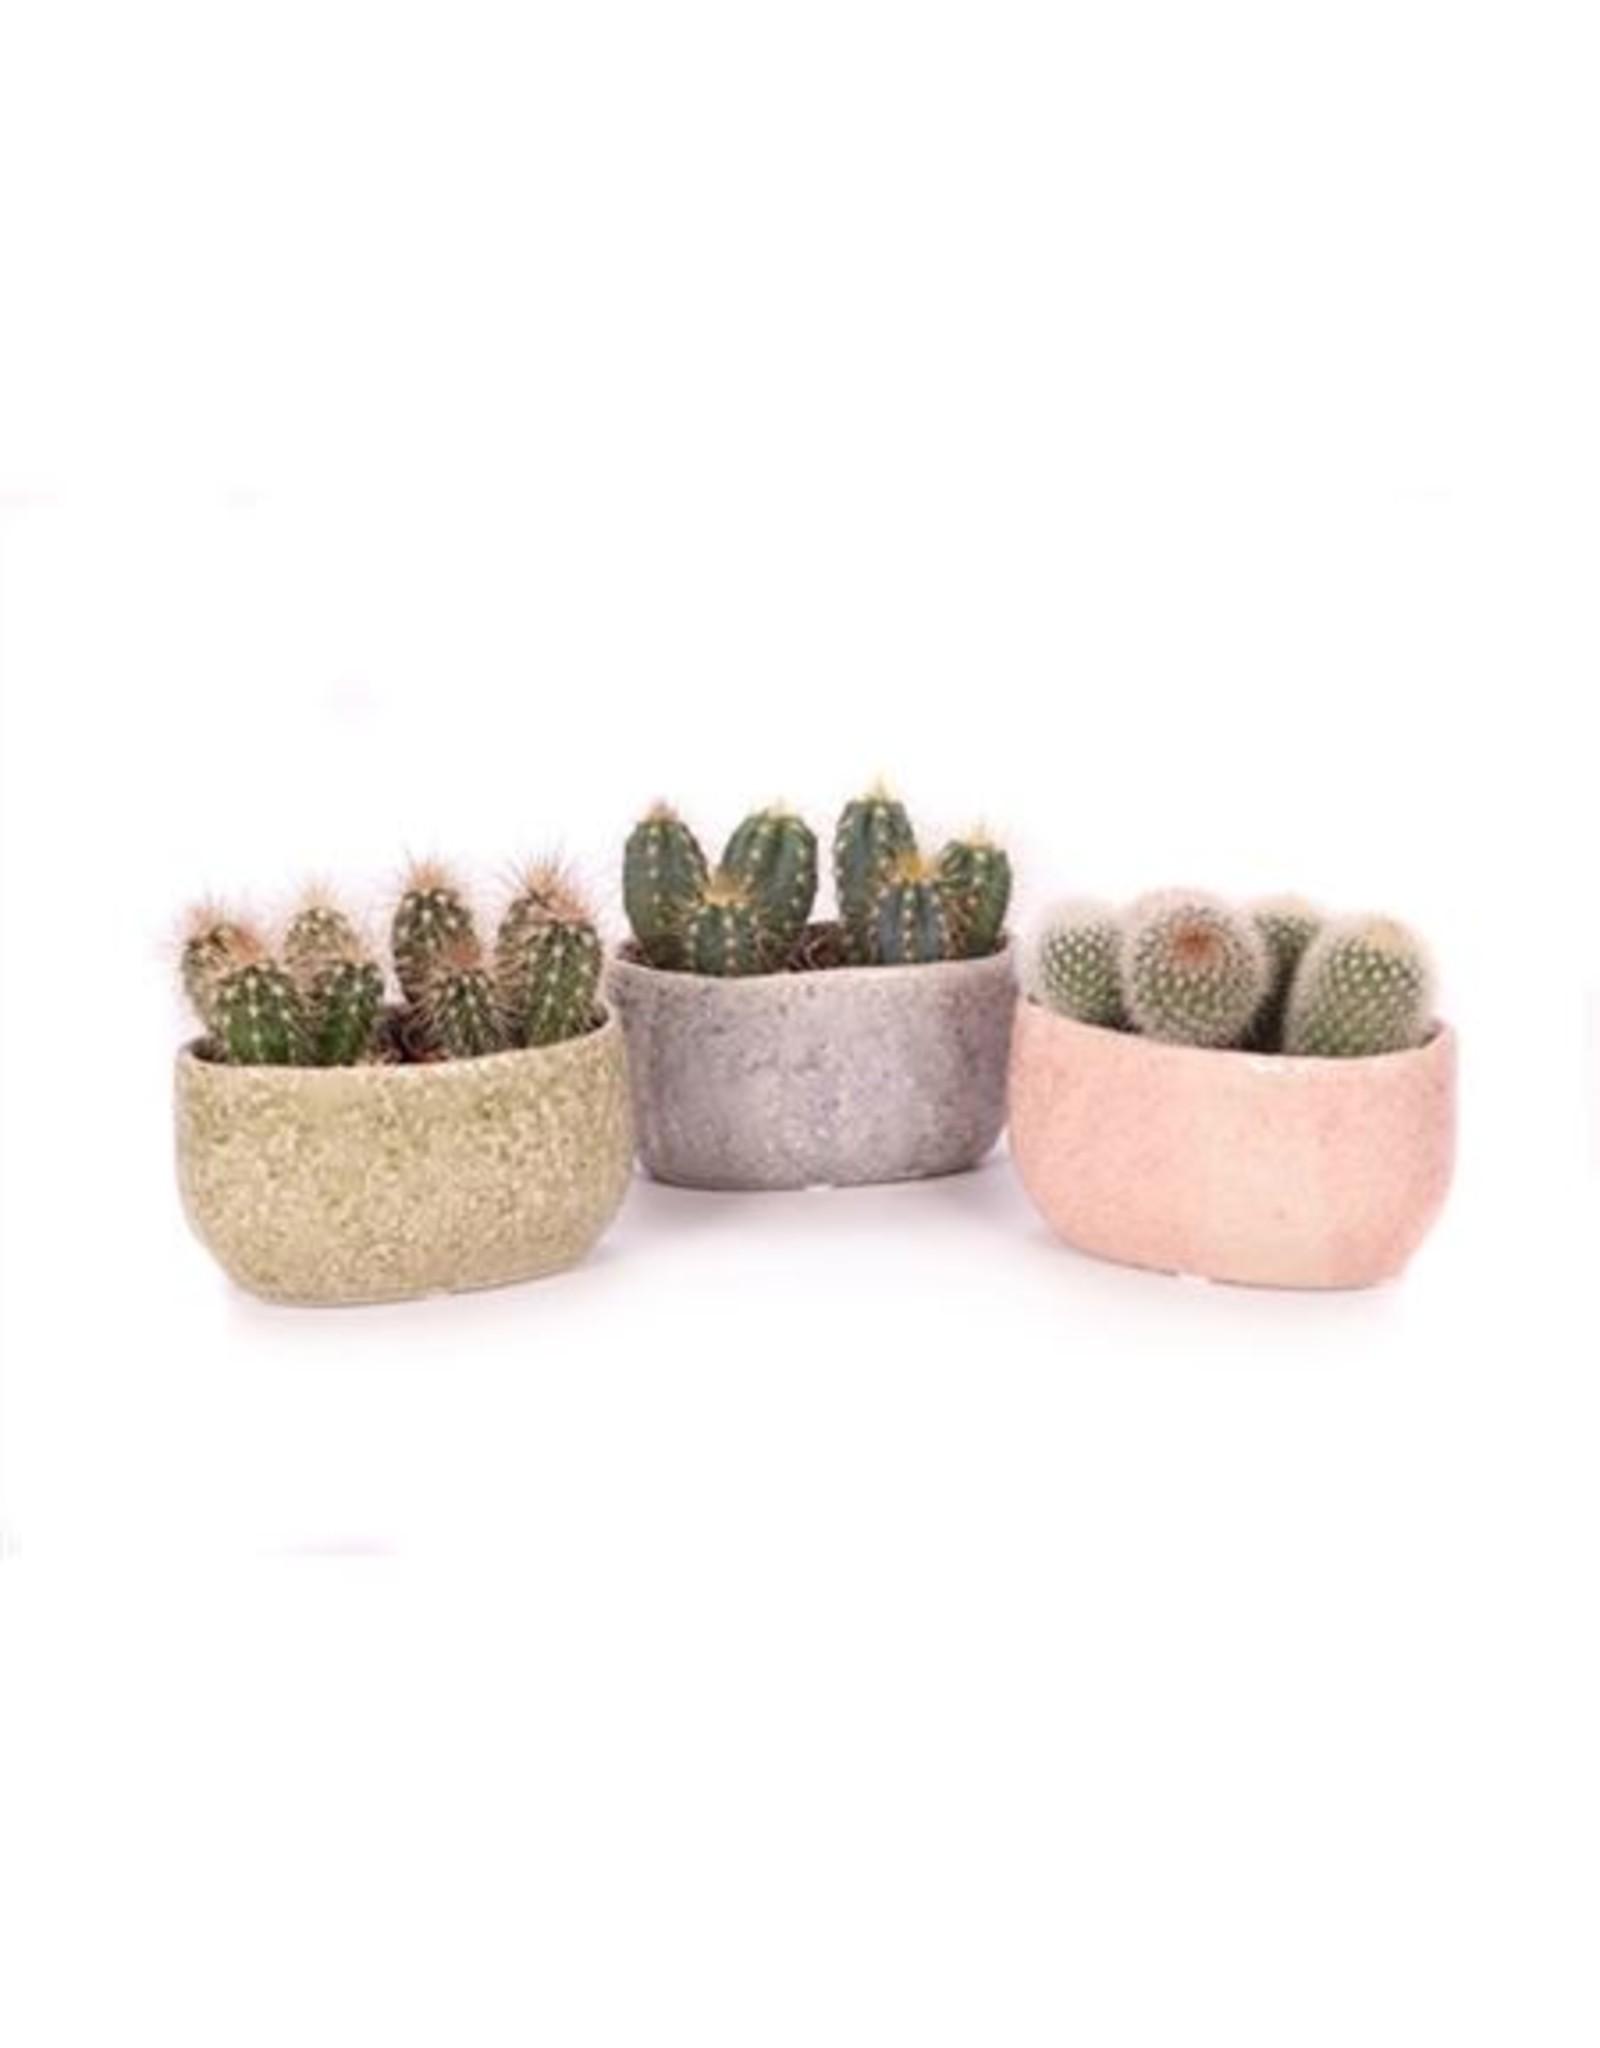 VDP 2x Cactus 6 Cm In La Quinta Ovaal x 10